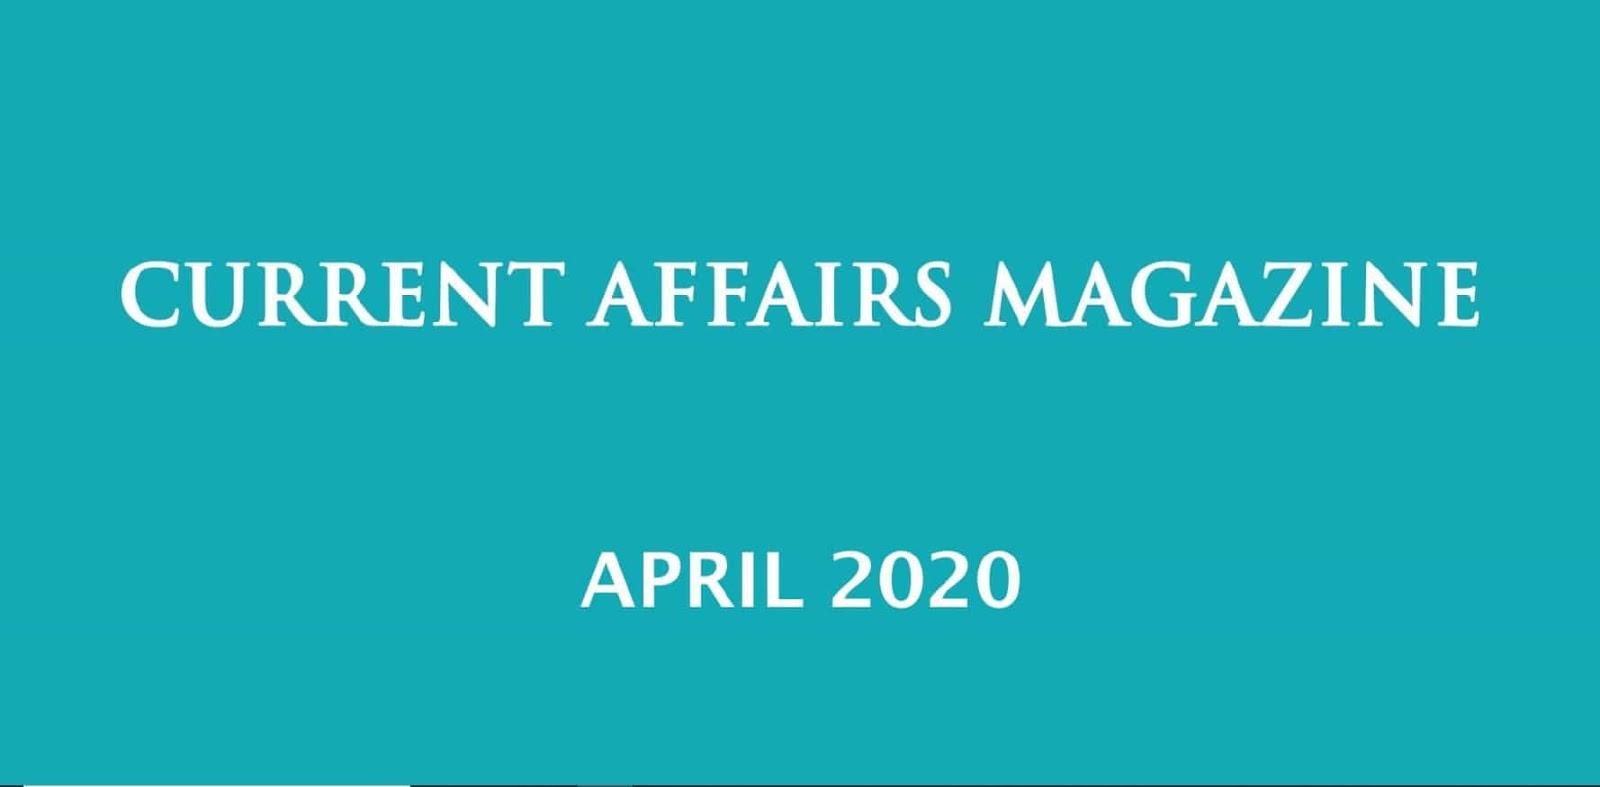 Current Affairs April 2020 iasparliament